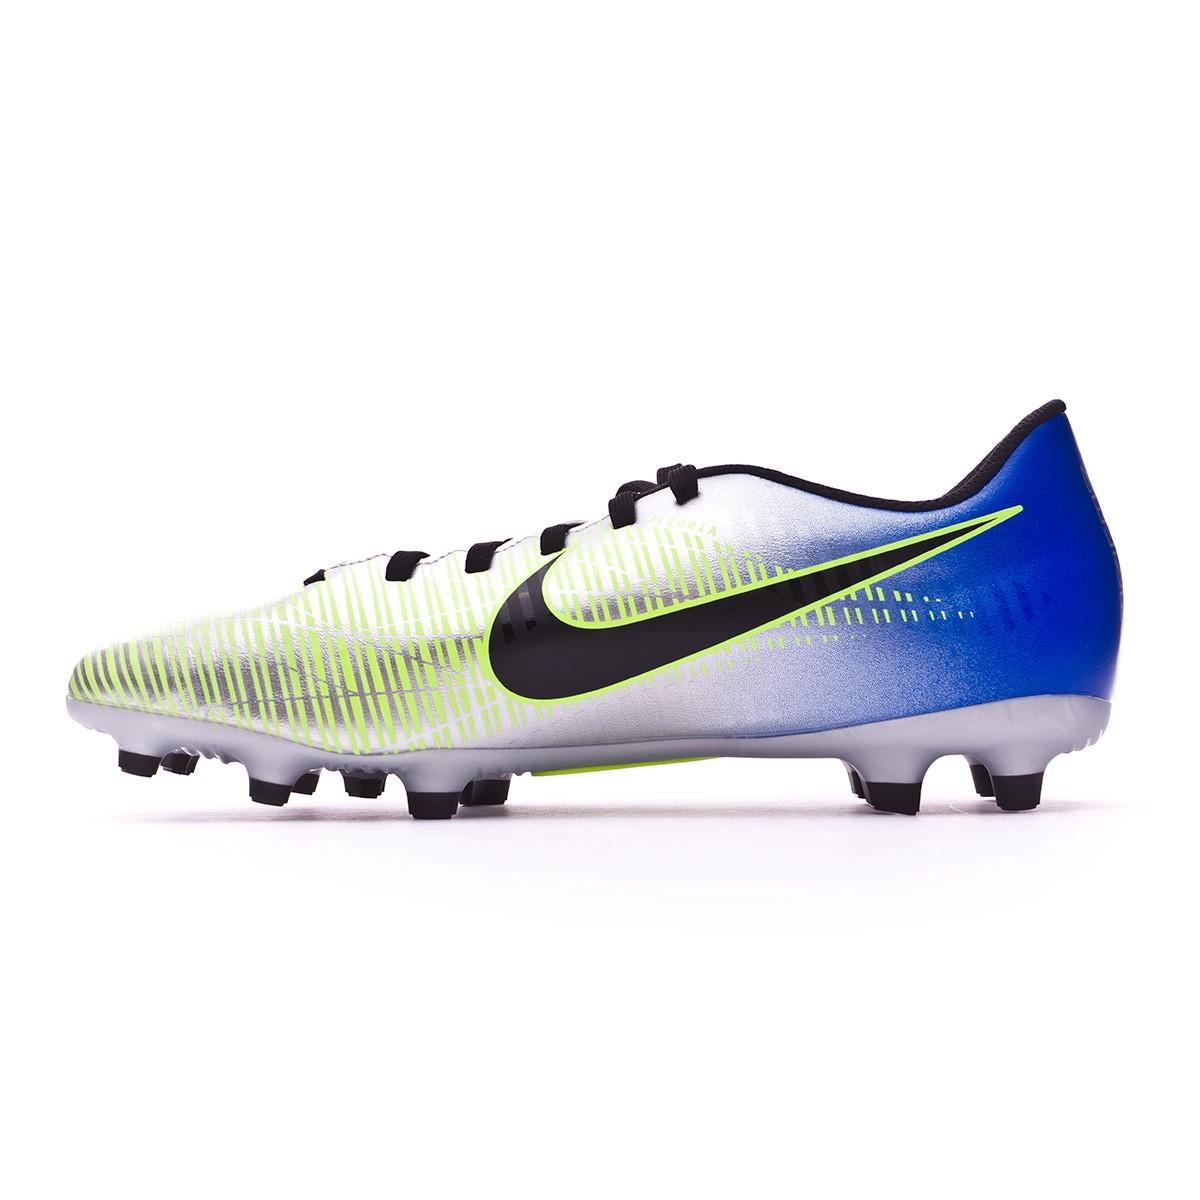 ... Bota Mercurial Vortex III FG Neymar Racer blue-Black-Chrome-Volt.  CATEGORY. Football boots · Nike football boots d8216793712